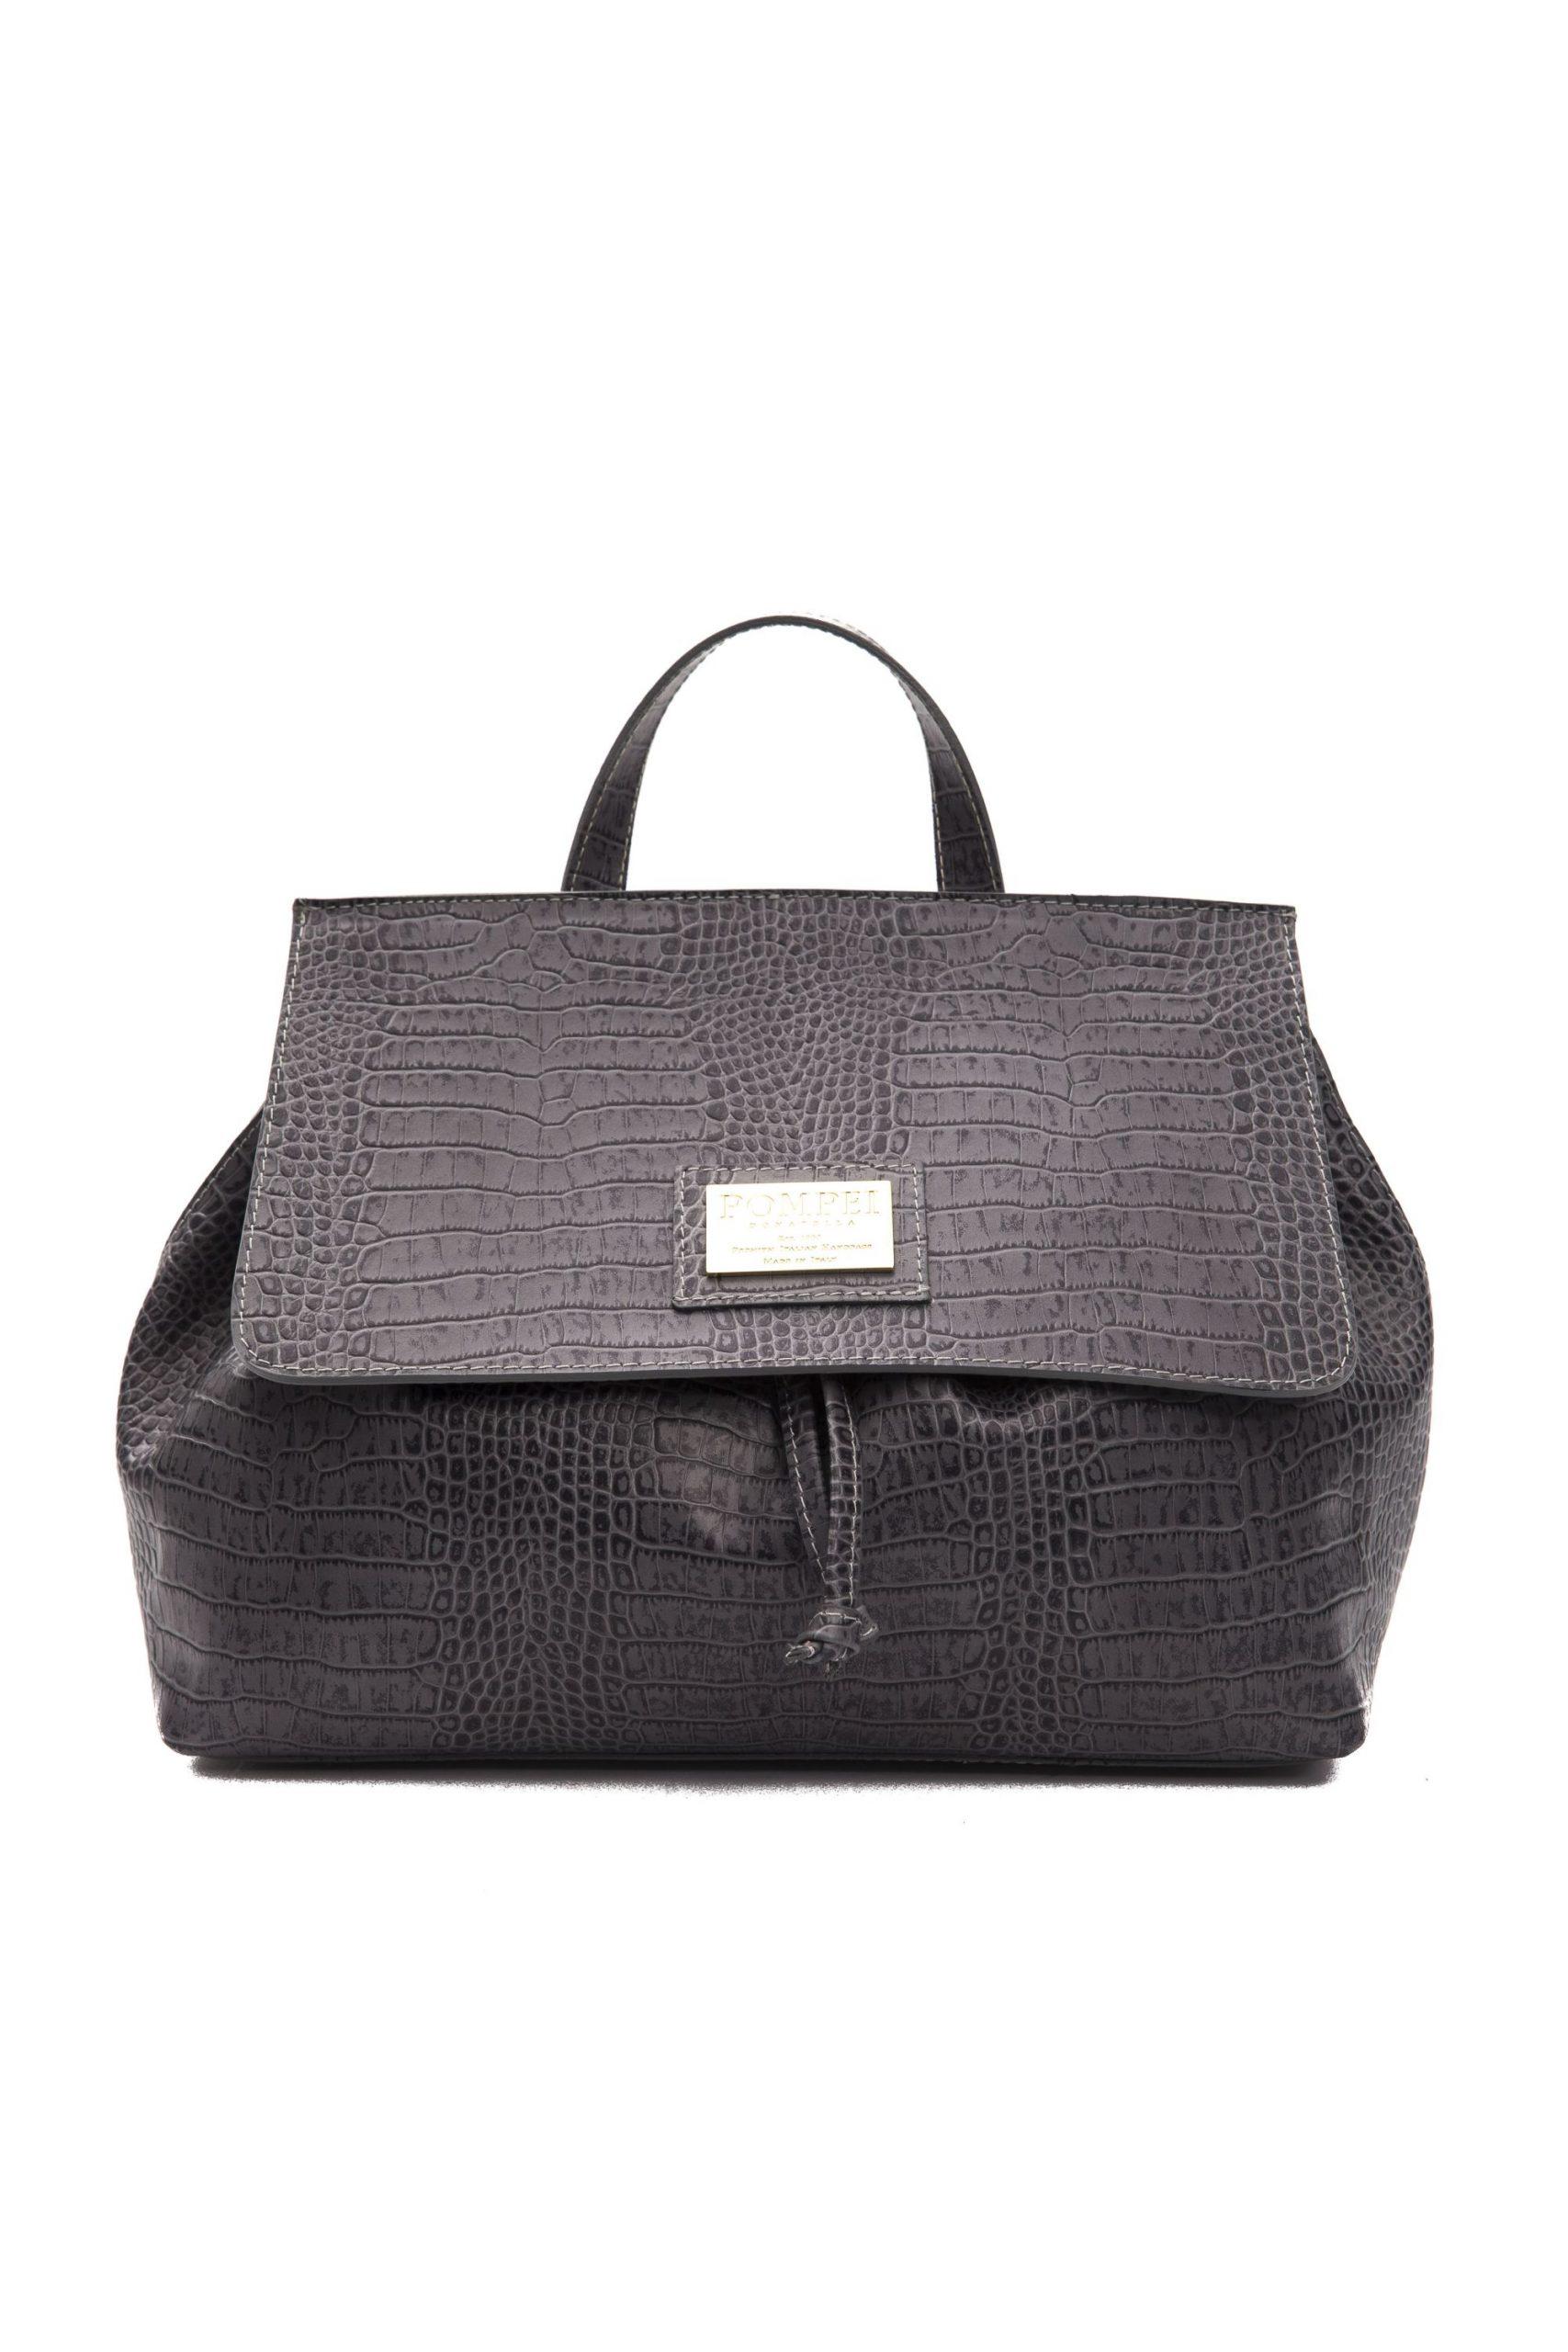 Pompei Donatella Women's Handbag Grey PO667682